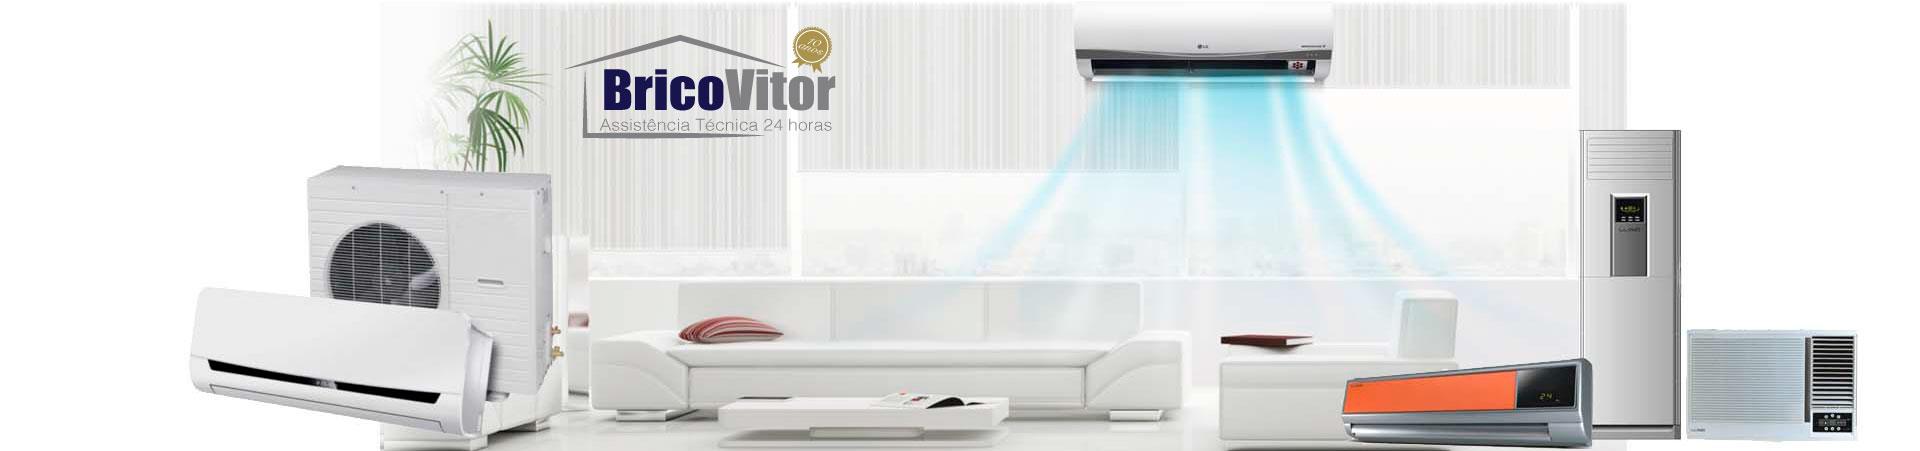 BricoVitor-Ar-condicionado-1 Assistência Ar Condicionado Torres Vedras - Lisboa